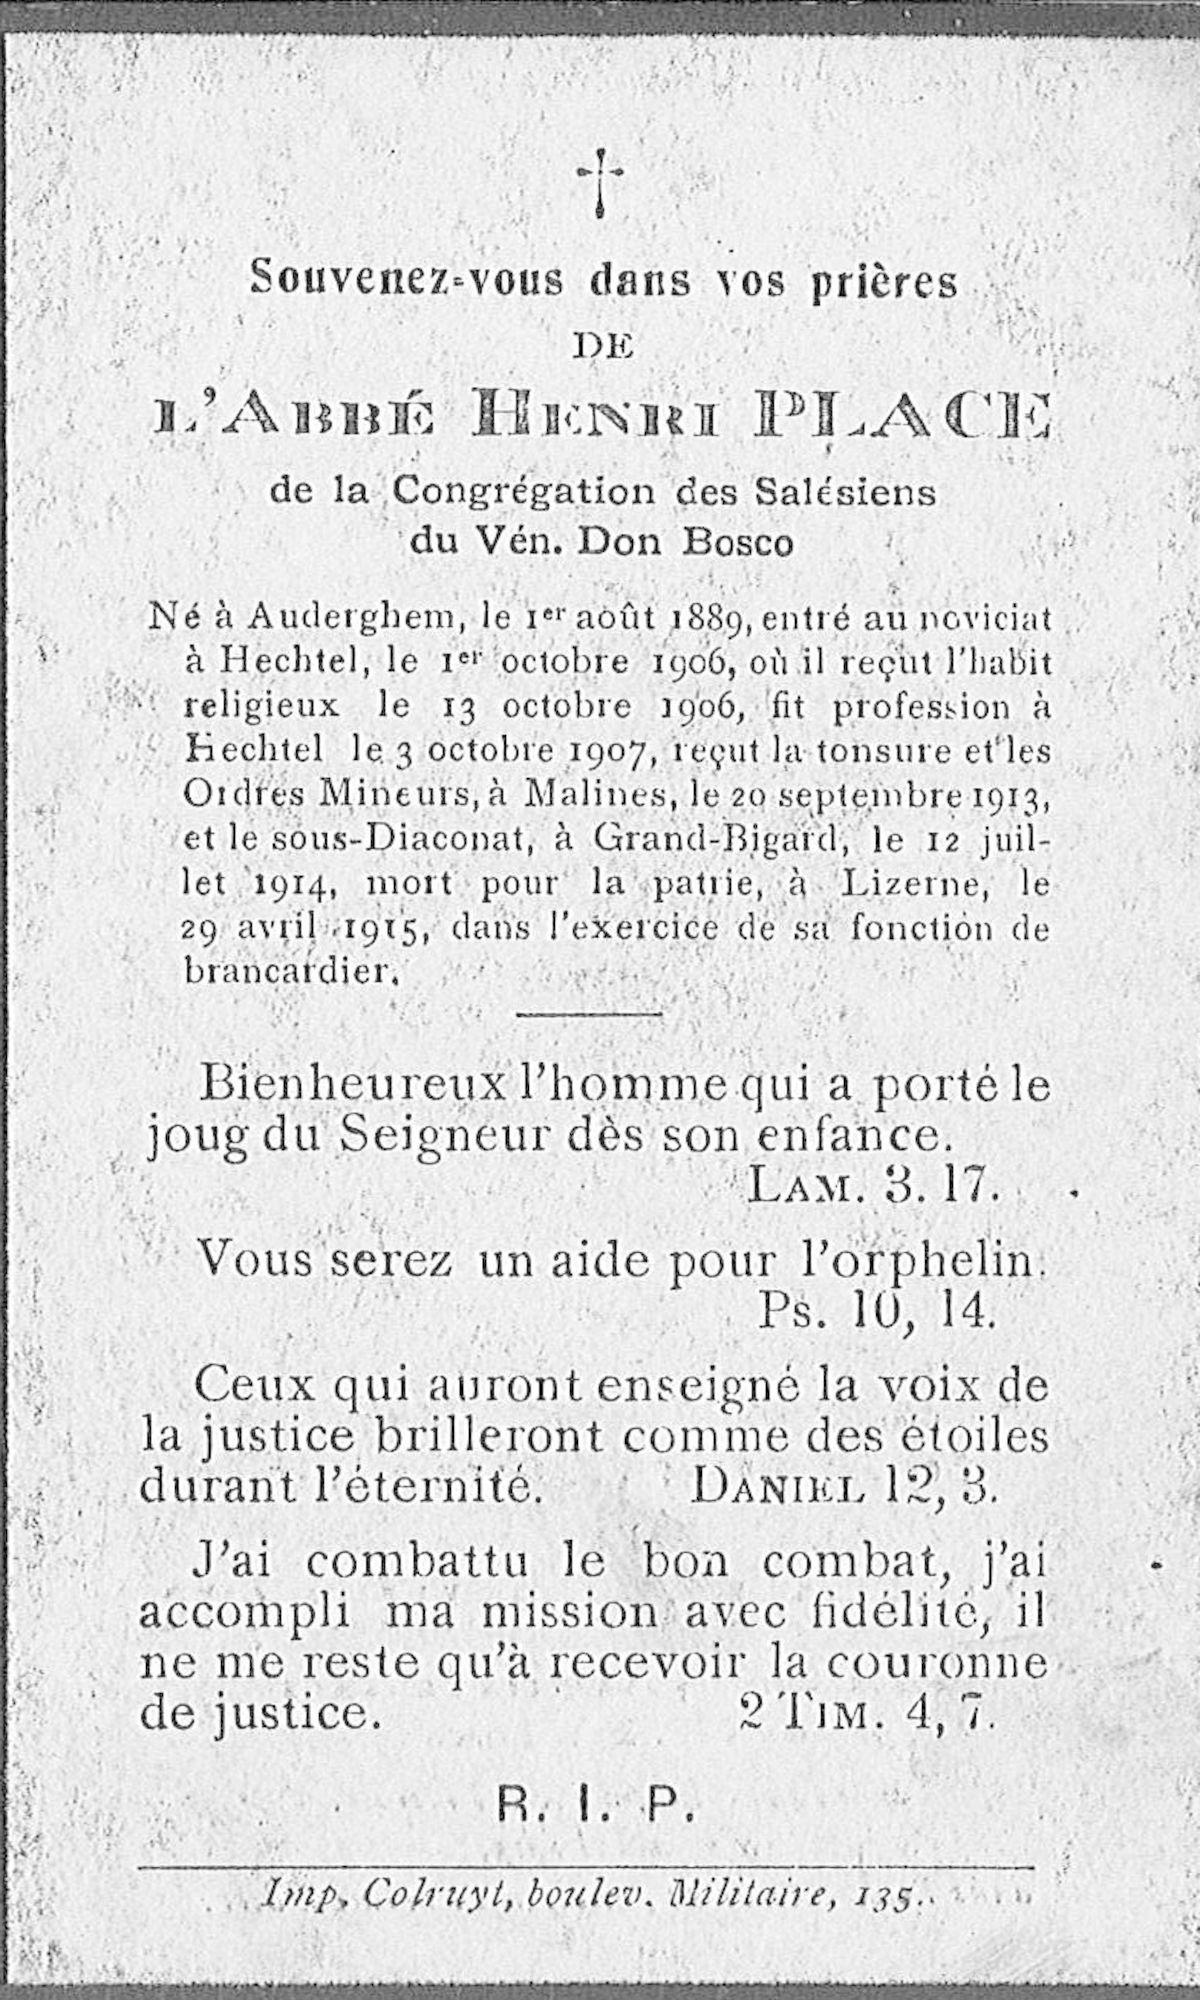 Henri Place